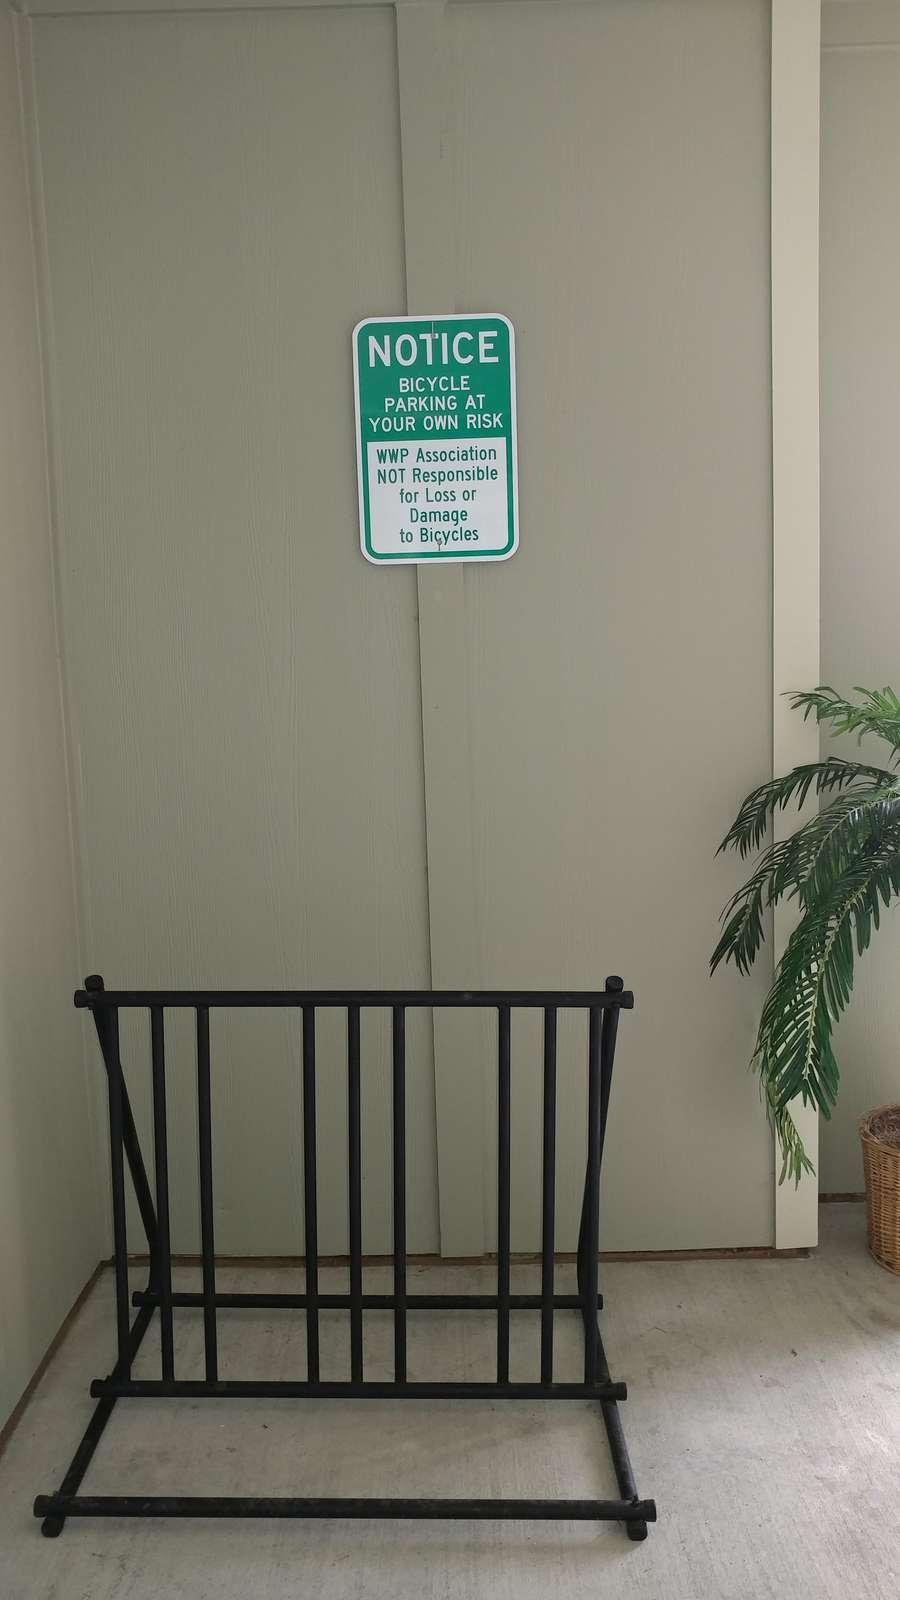 Located near the elevator